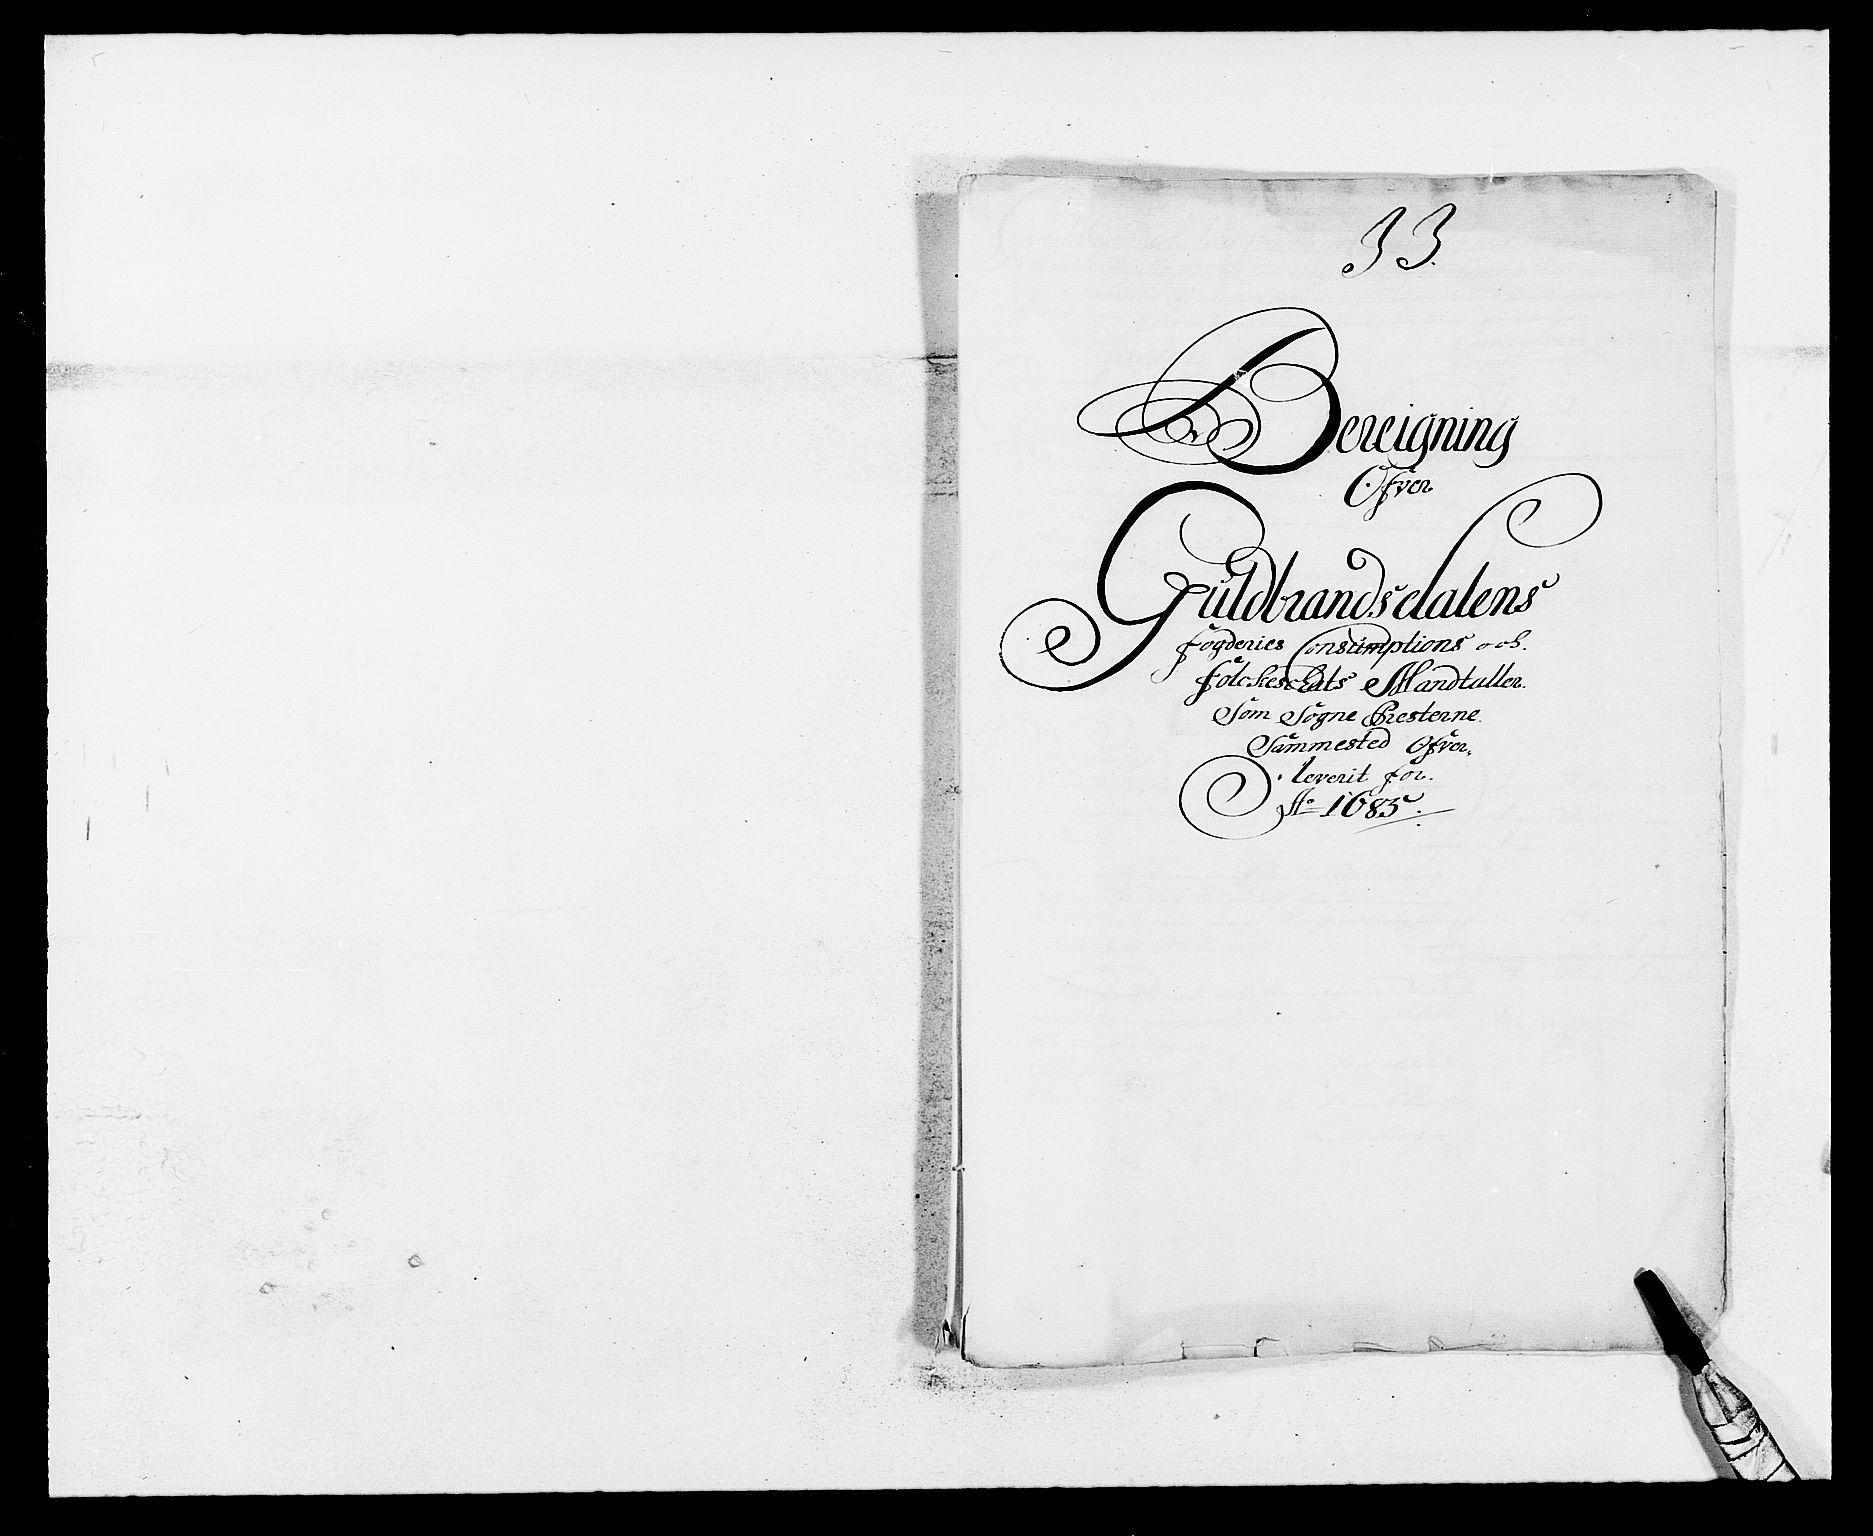 RA, Rentekammeret inntil 1814, Reviderte regnskaper, Fogderegnskap, R17/L1160: Fogderegnskap Gudbrandsdal, 1682-1689, s. 257